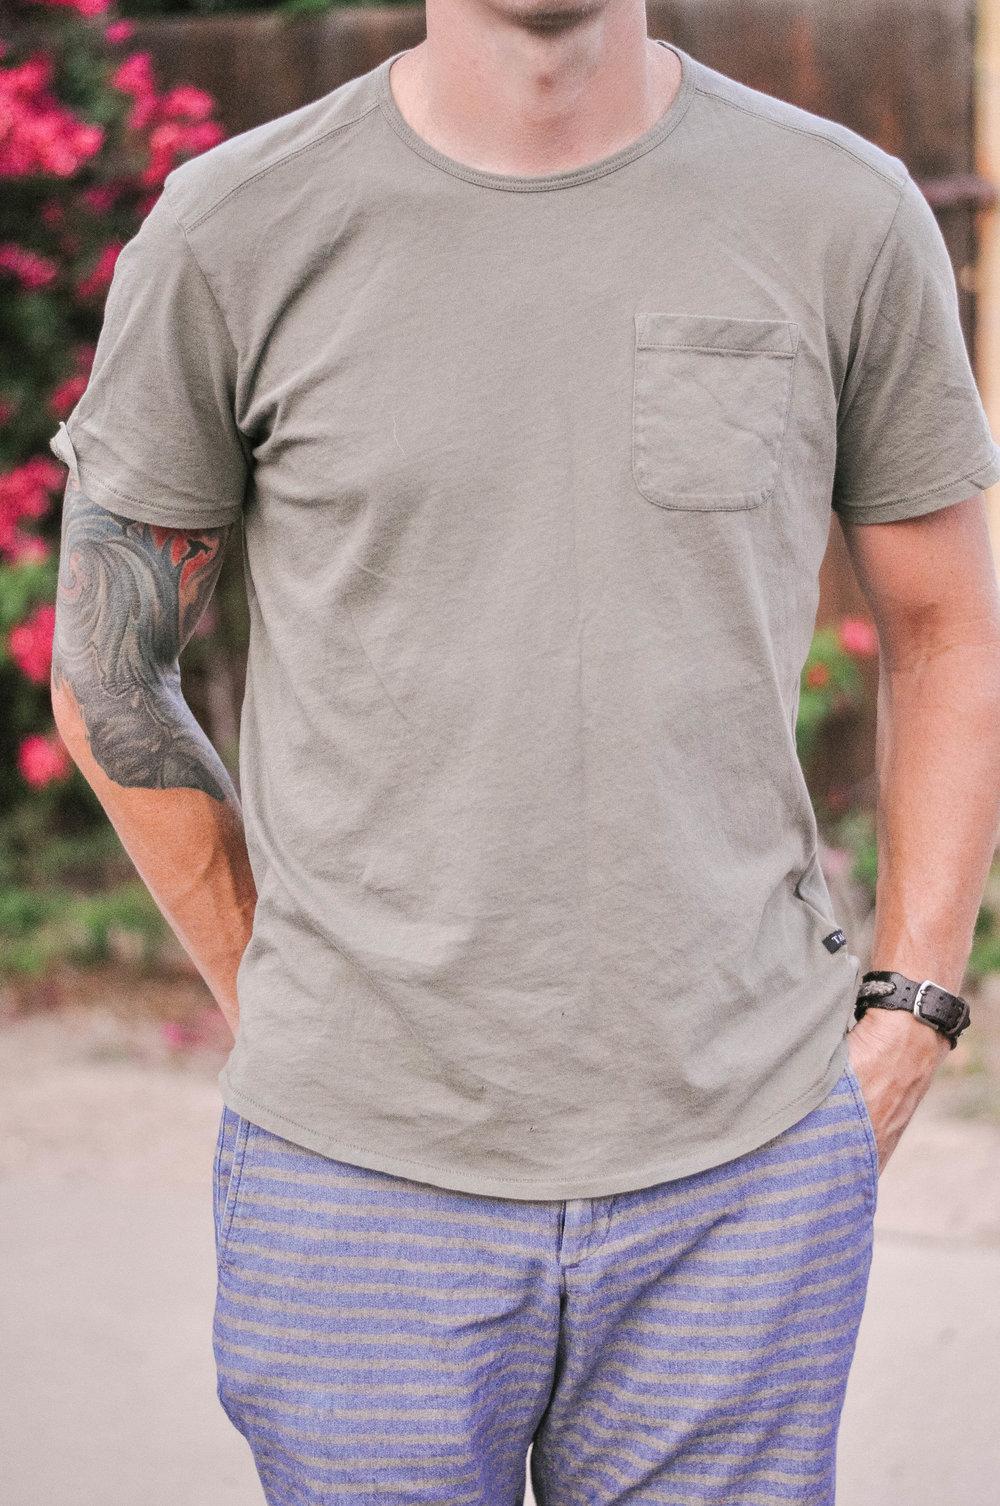 Mens-Urban-Outfitters-Tee-2.jpg